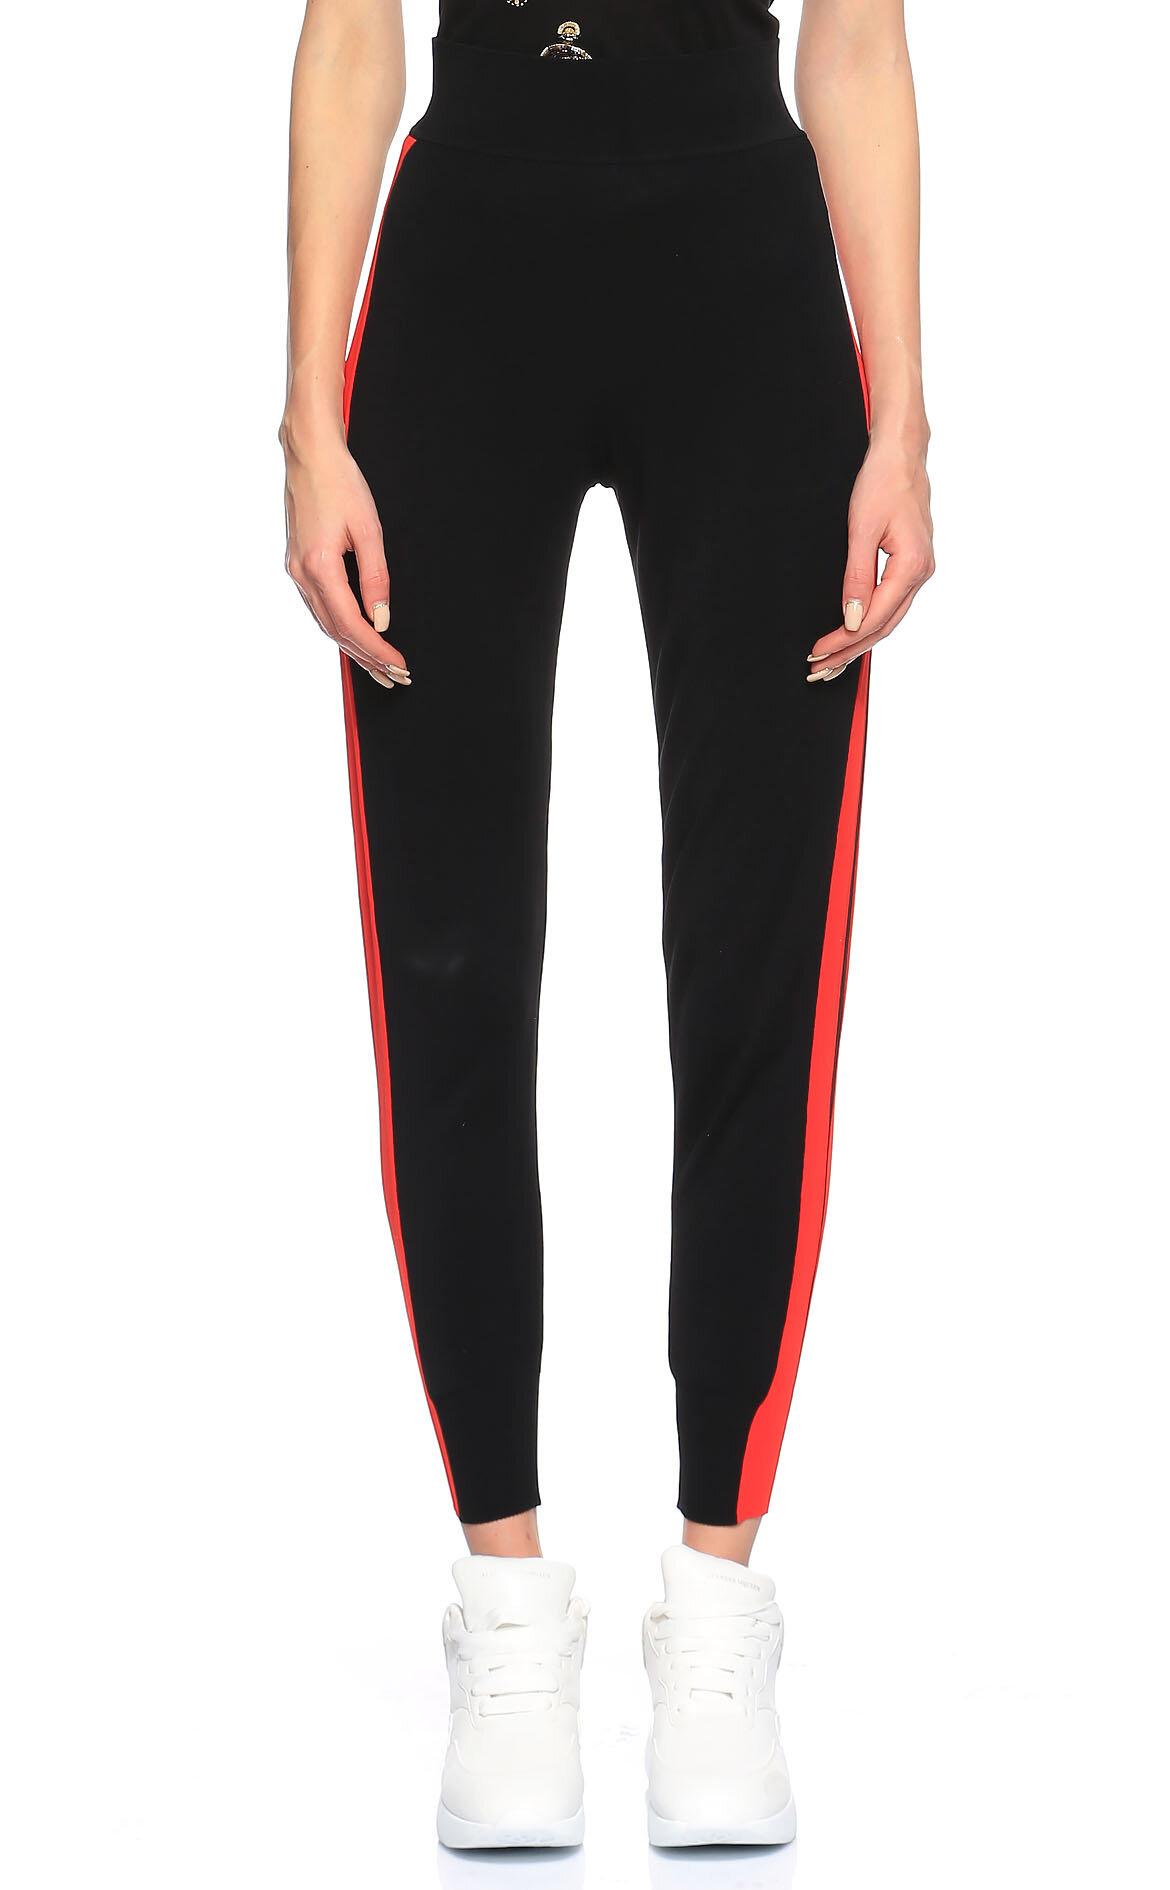 Alexander McQueen-Alexander McQueen Çizgili Siyah-Kırmızı Pantolon